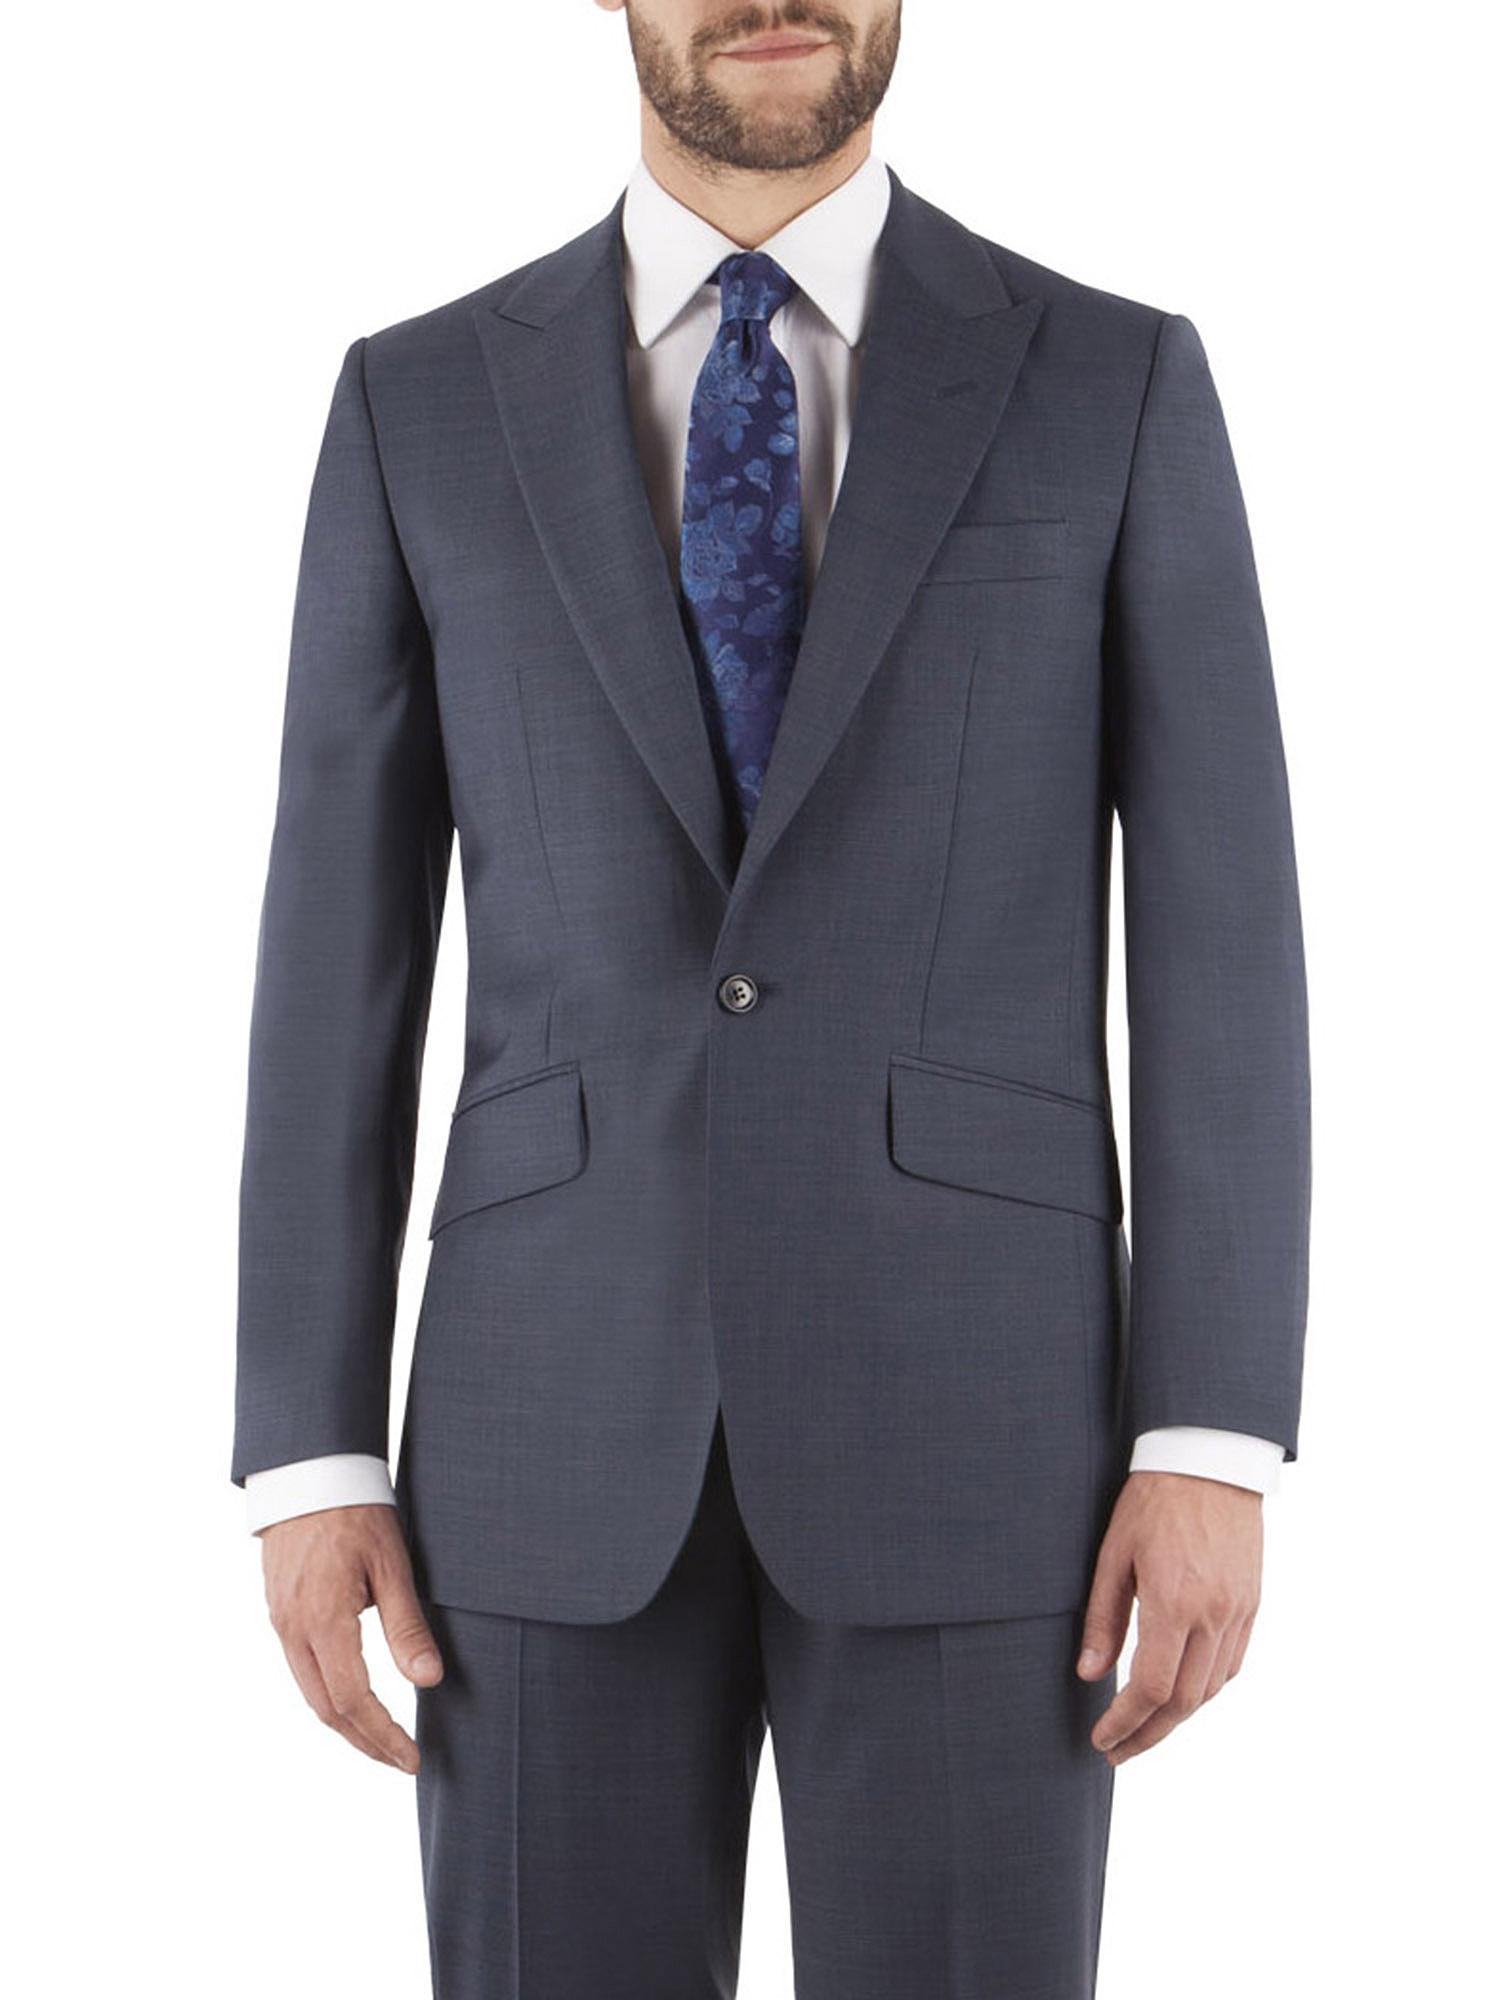 52fb4c34d910 Dark Airforce Blue Pick & Pick Tailored Fit Suit - Two Piece Suits ...